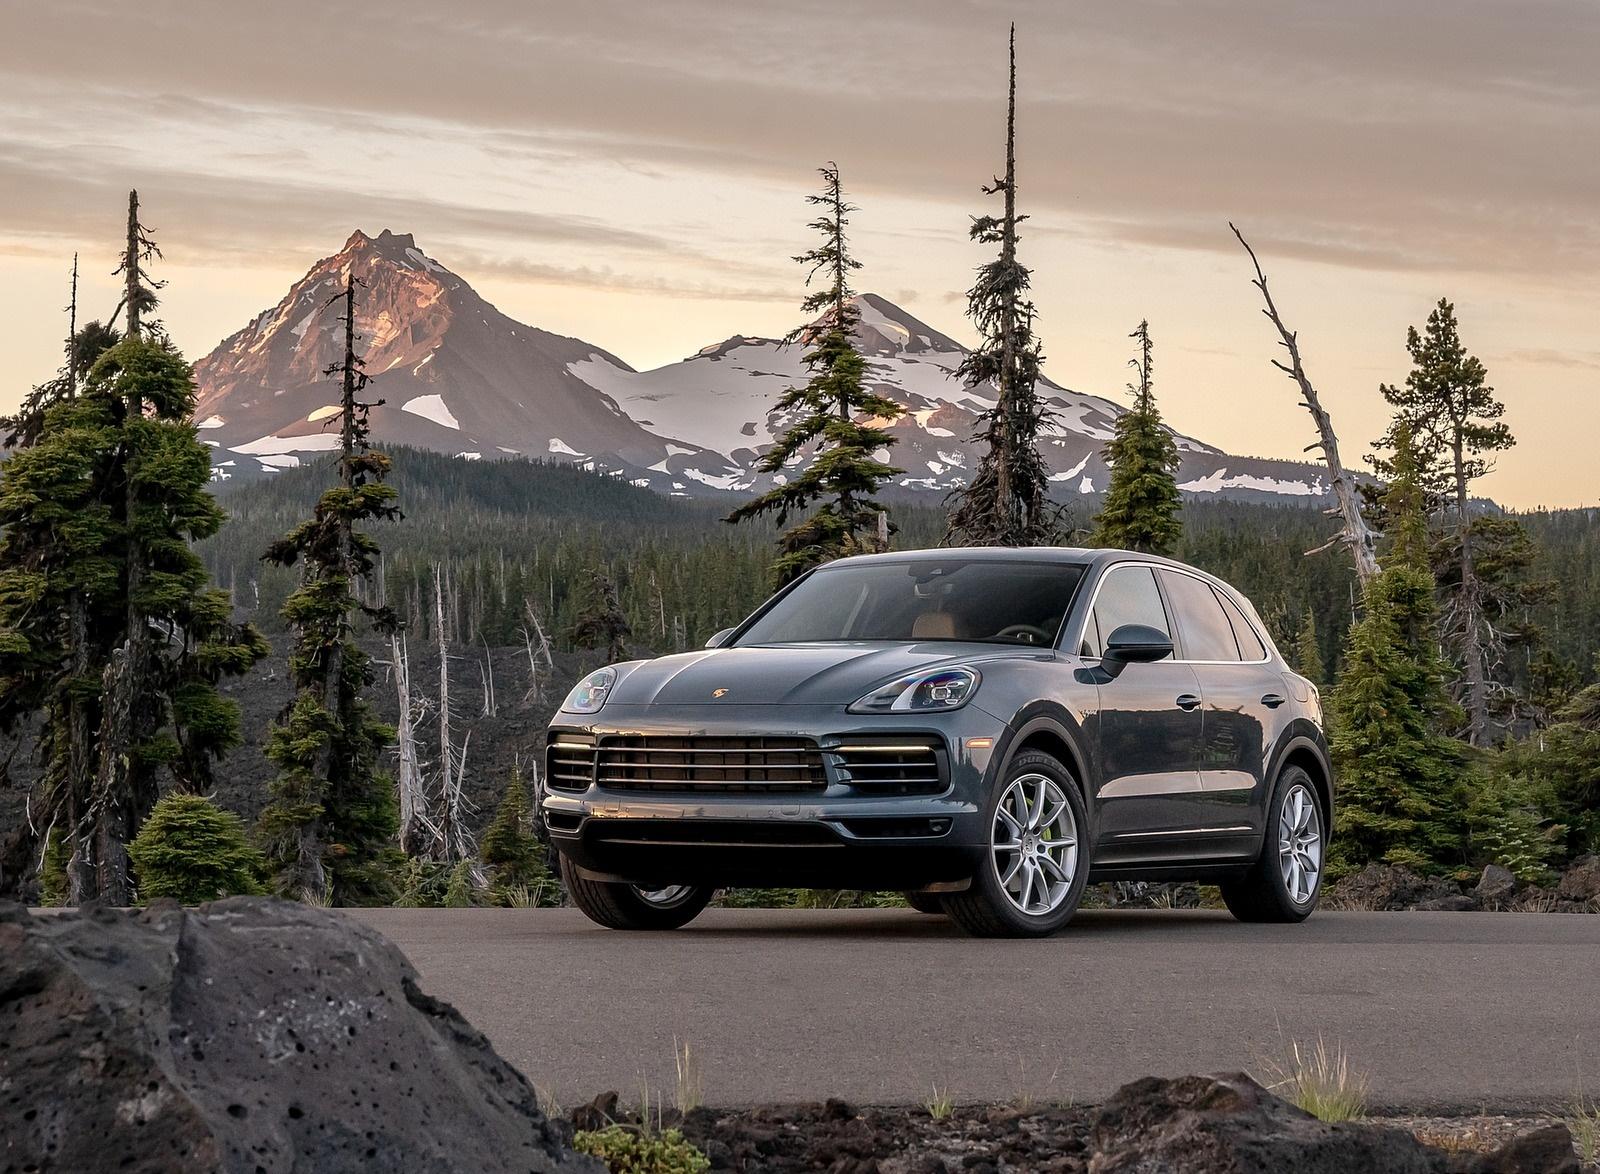 2019 Porsche Cayenne E-Hybrid (US-Spec) Front Three-Quarter Wallpapers #18 of 37